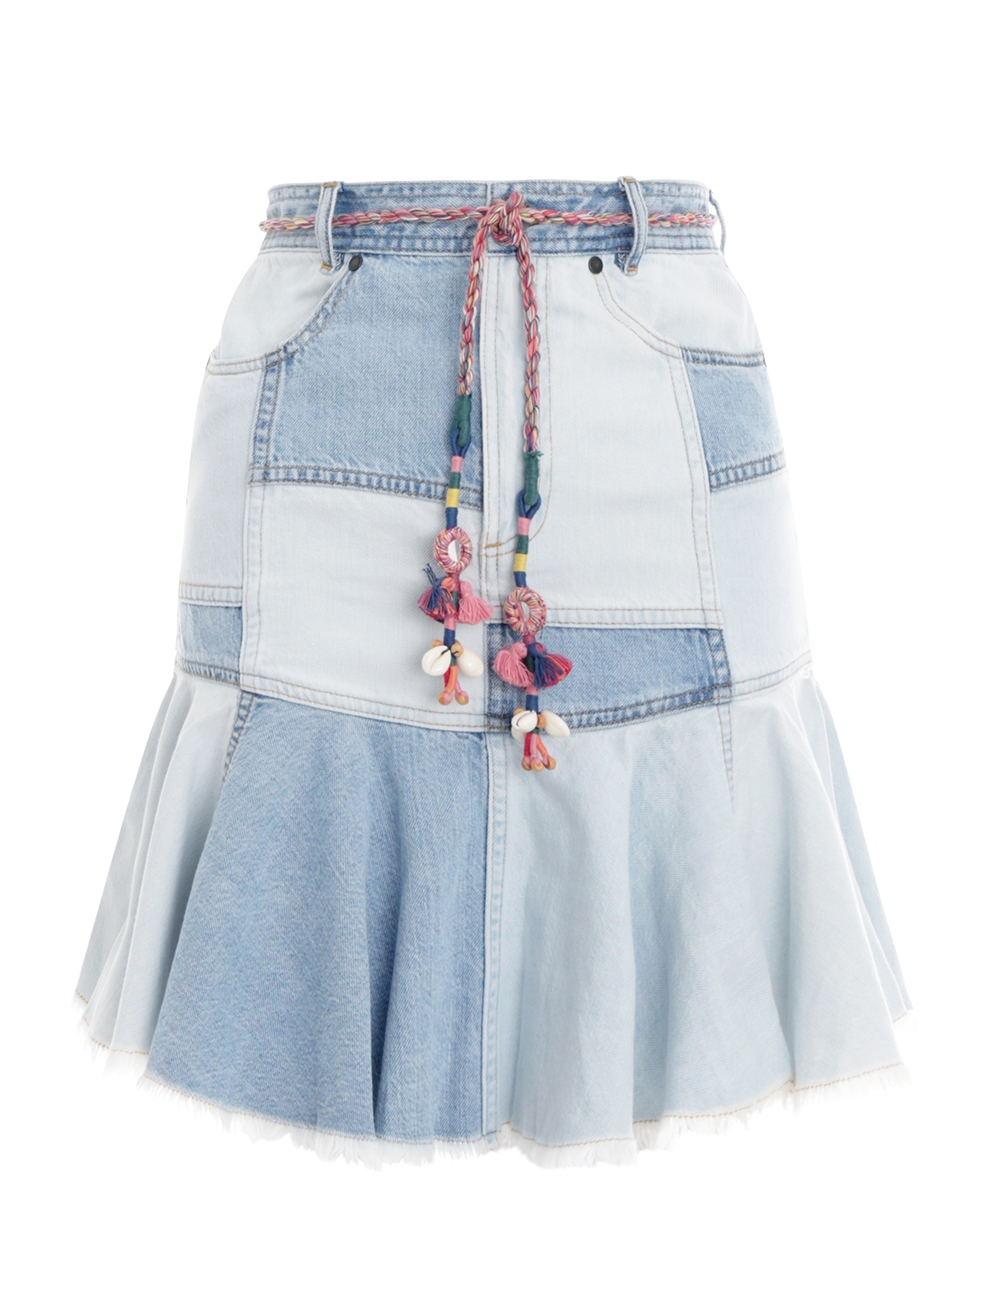 Edie Patchwork Denim Skirt